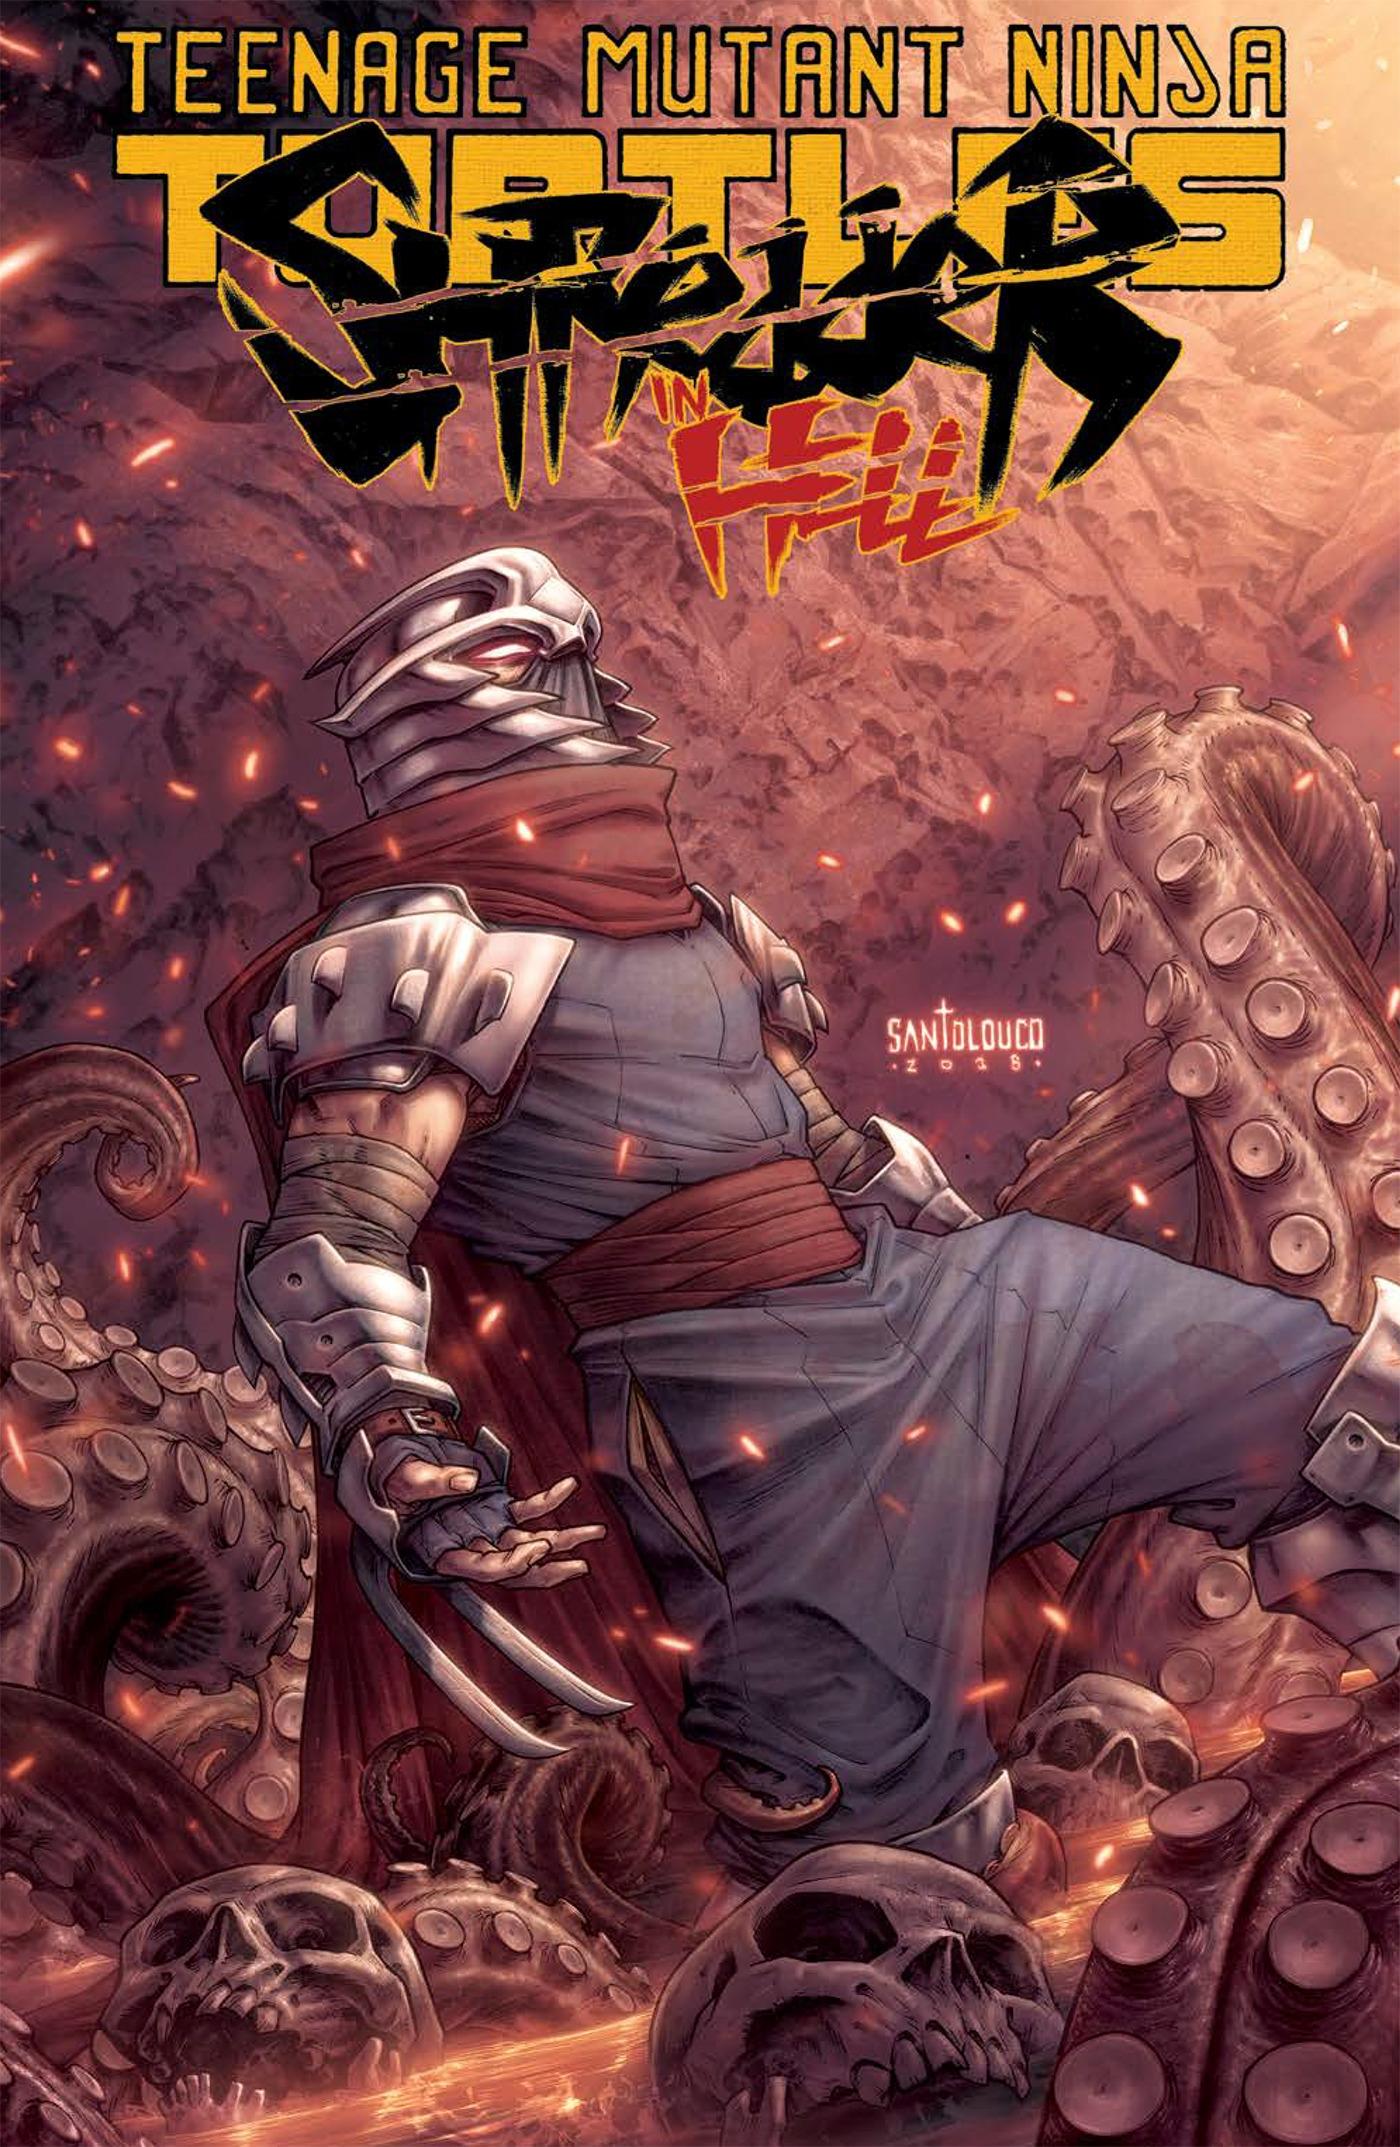 Teenage Mutant Ninja Turtles Shredder In Hell By Mateus